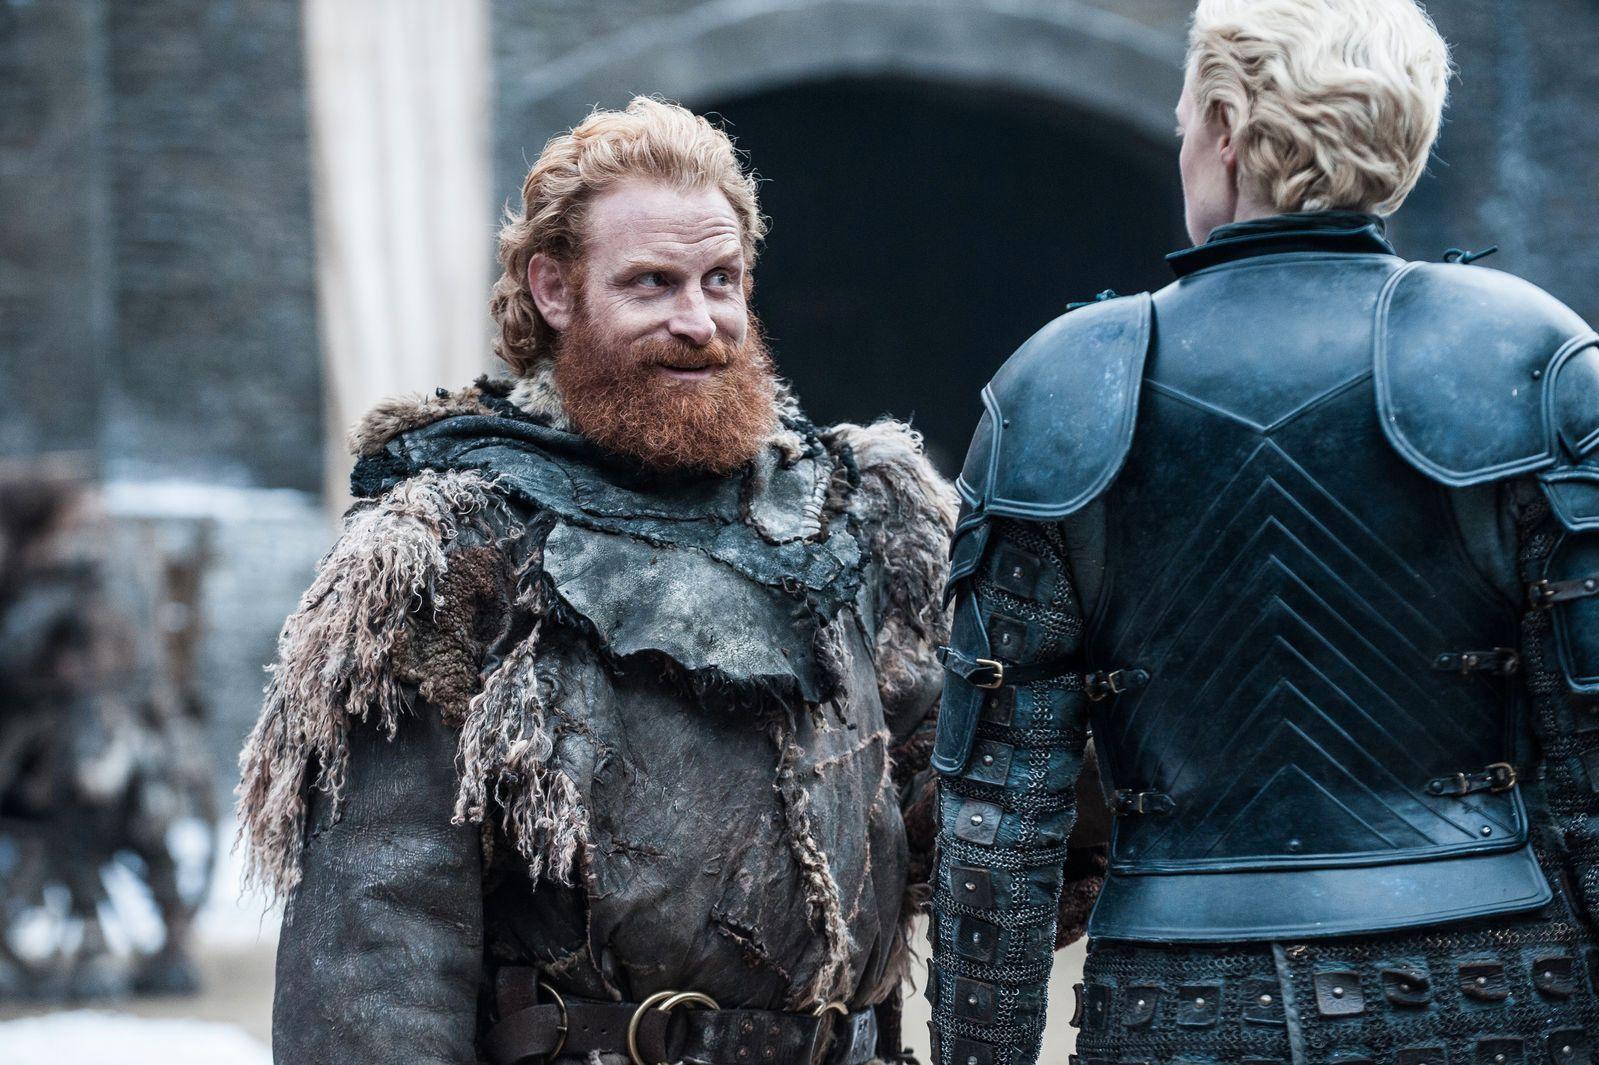 HIVJU ER MED: Kristofer Hivju som Tormund Giantsbane og Gwendoline Christie som Brienne of Tarth.